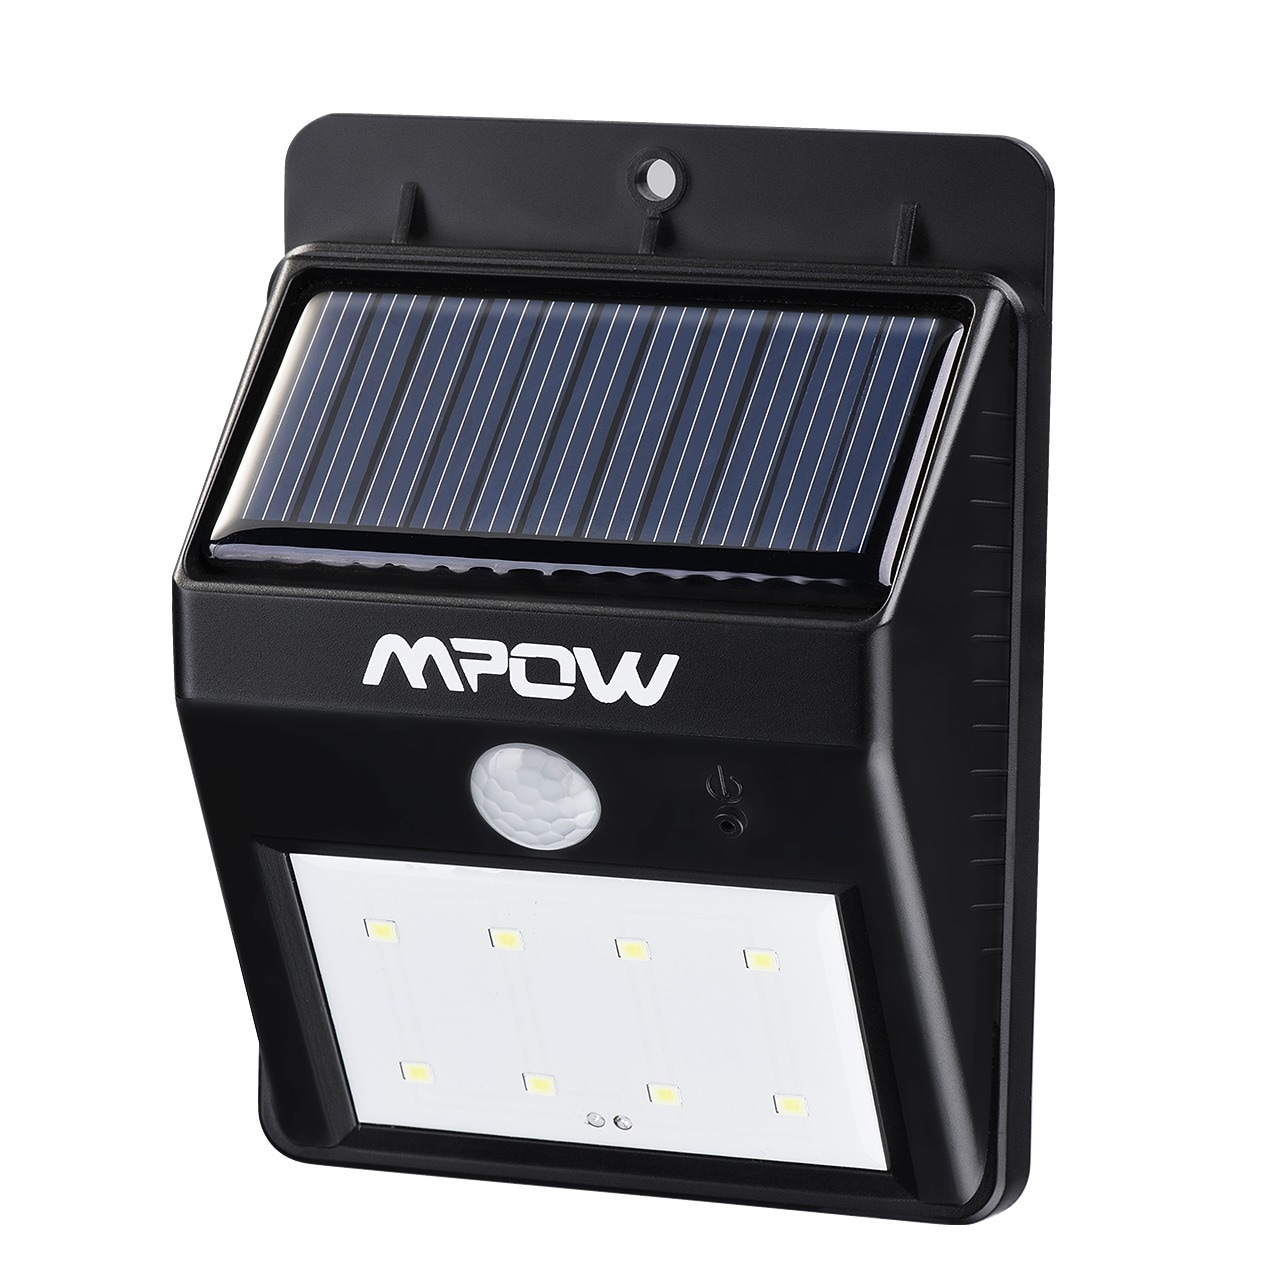 Mpow Solar-powered Wireless Outdoor Motion Sensor Light (...